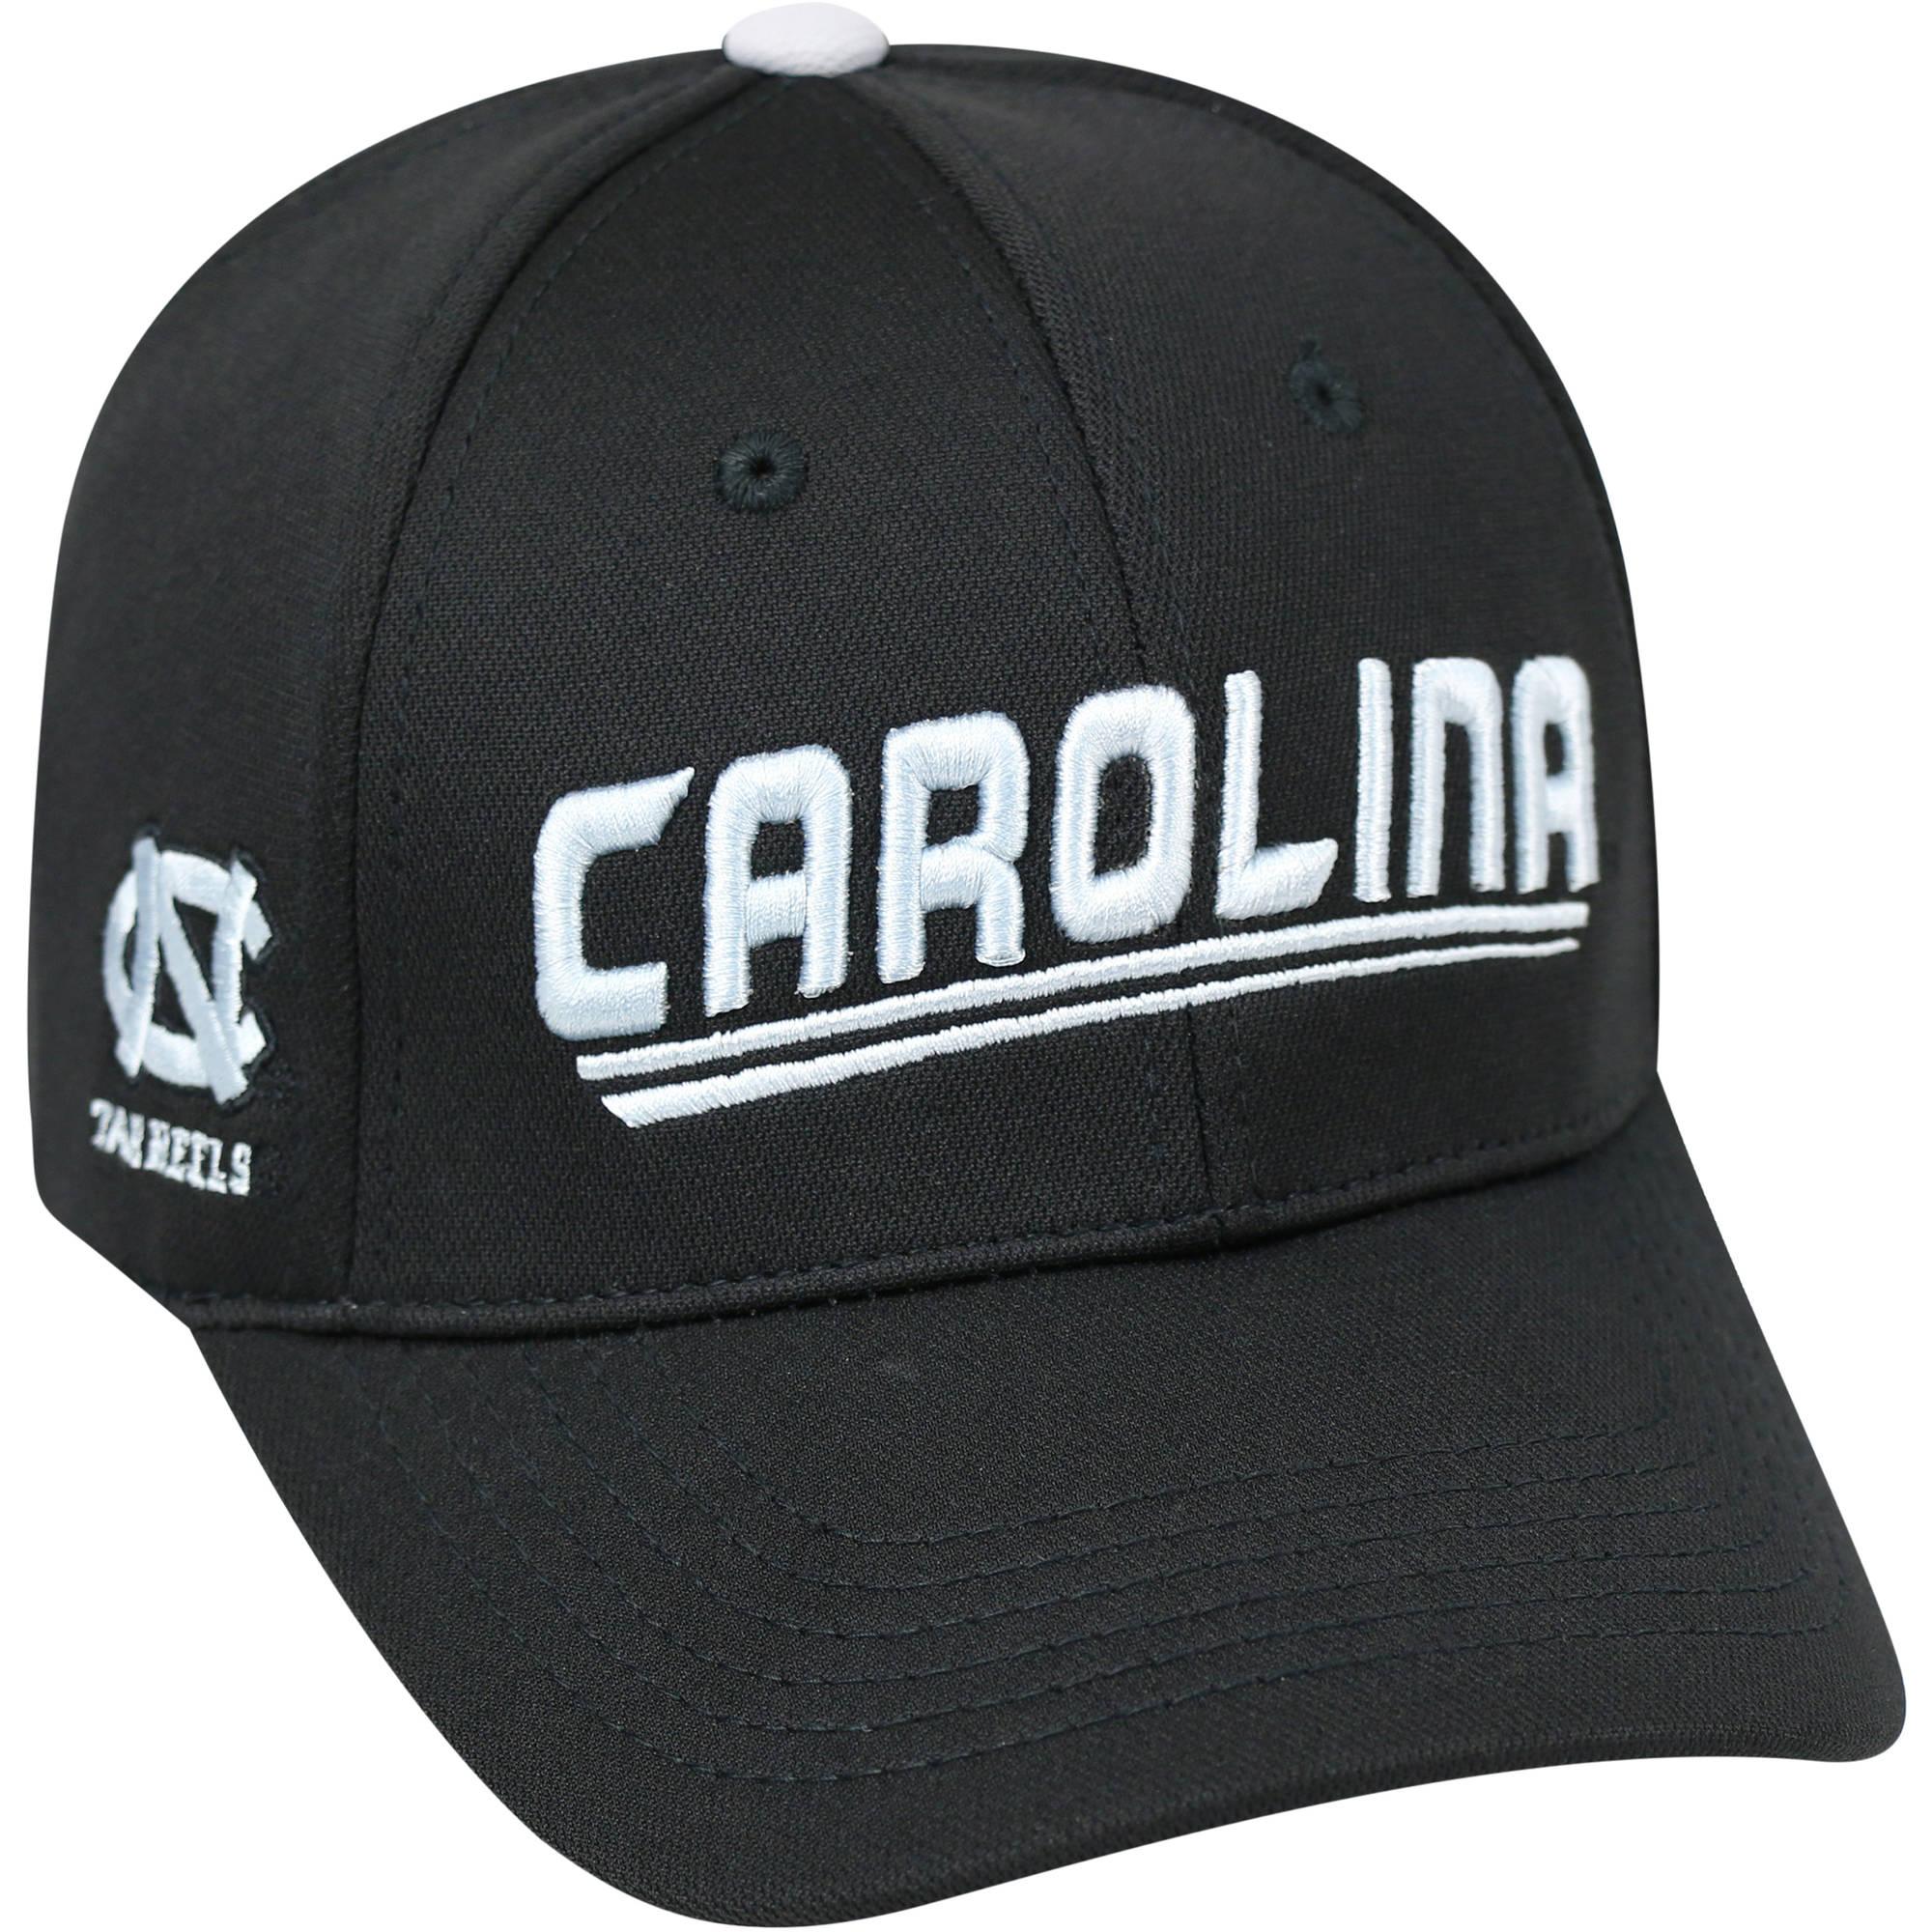 University Of North Carolina Tar Heels Black Baseball Cap